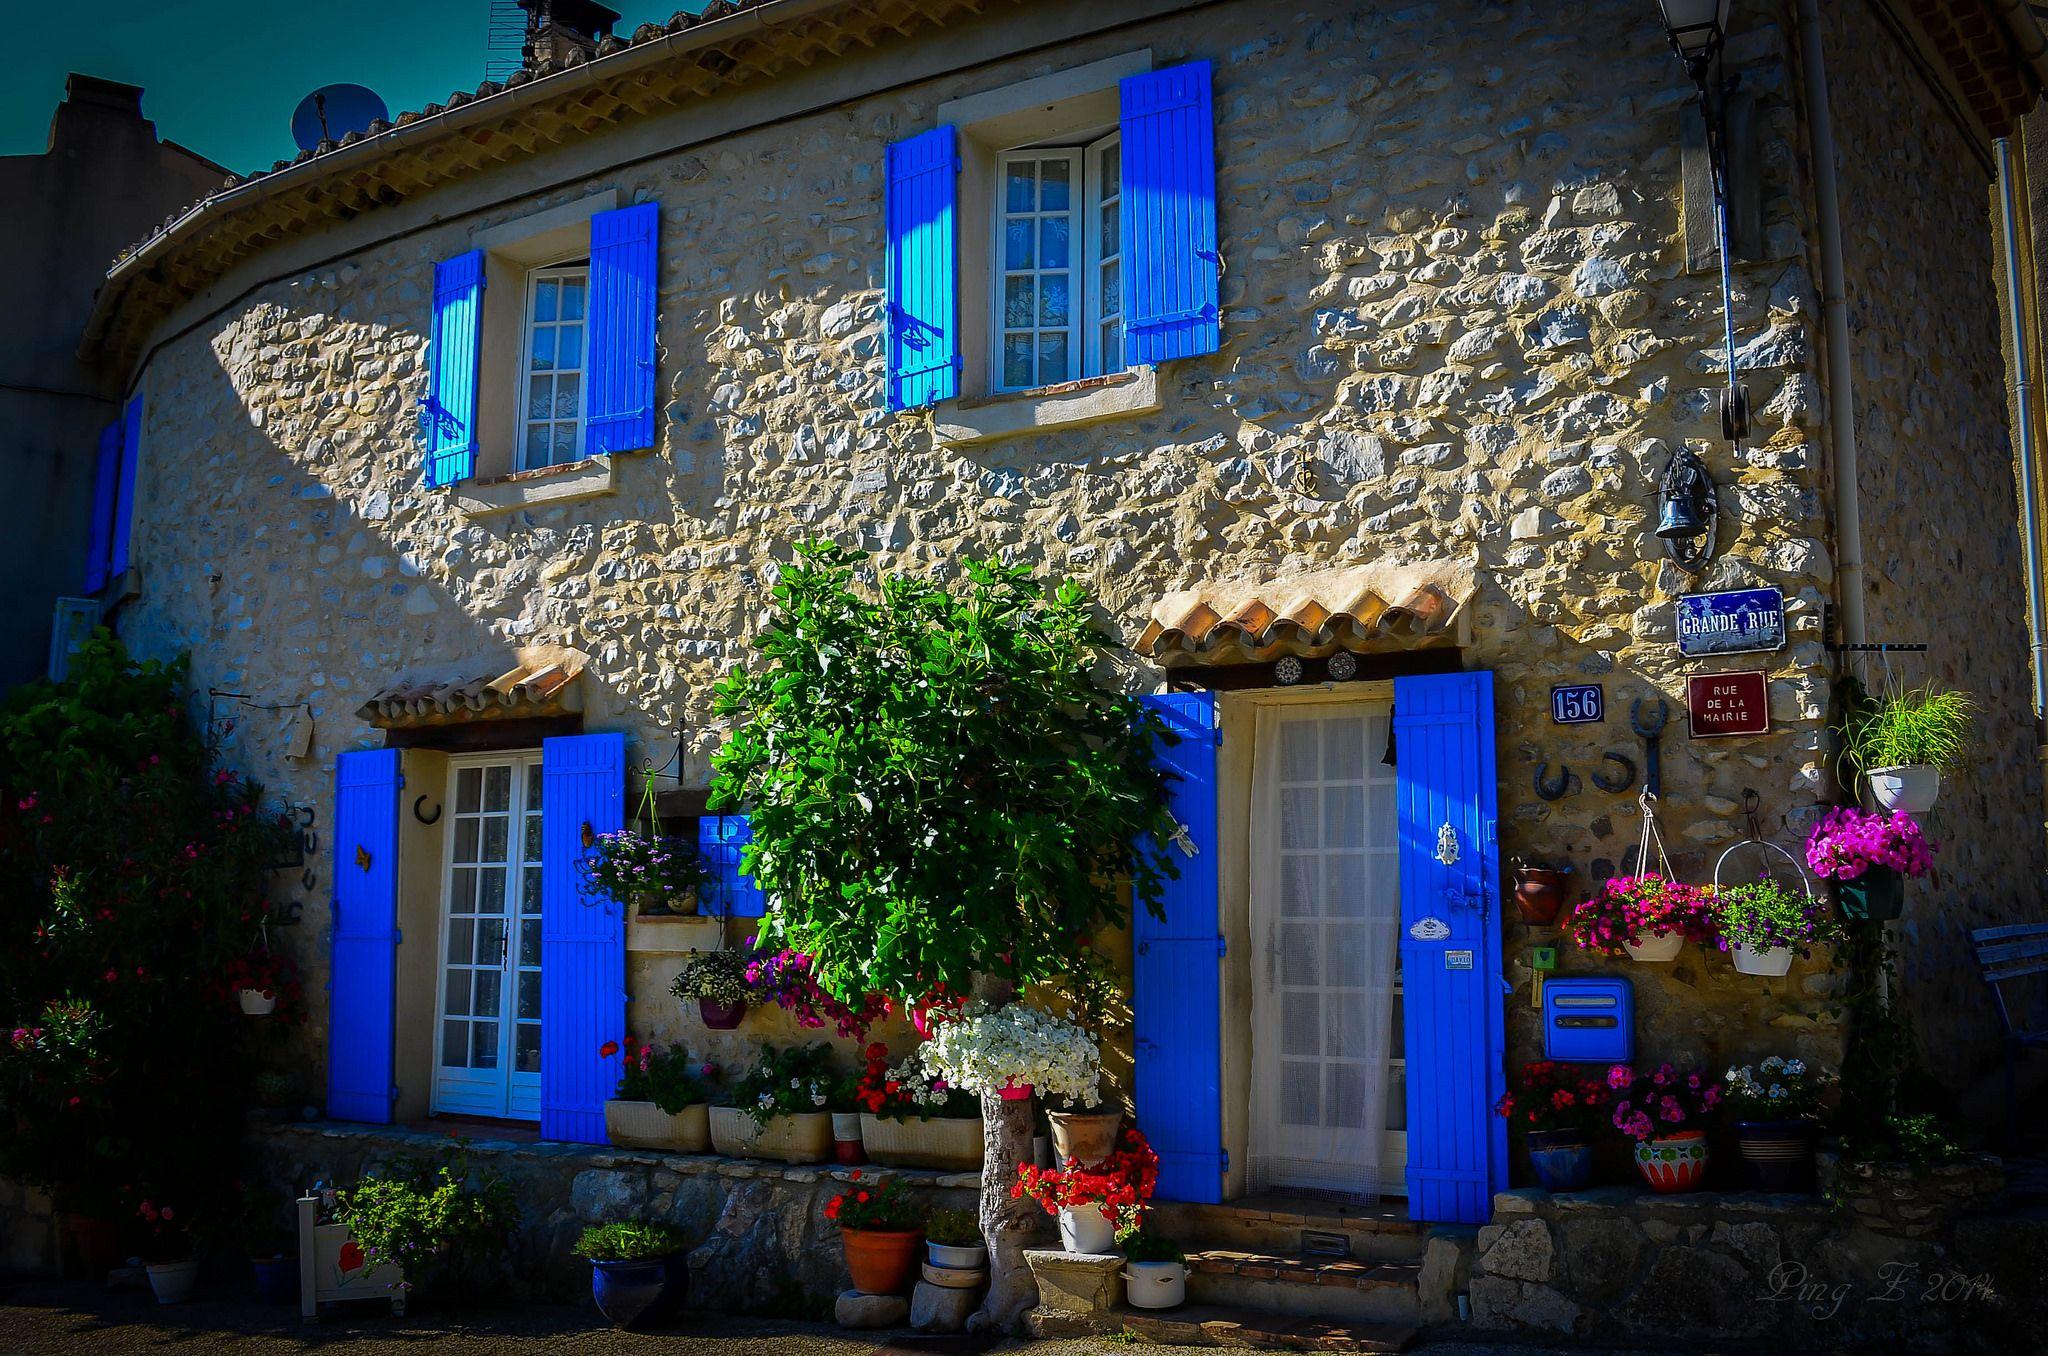 https://flic.kr/p/r3oNx3 | 2-ProvenceDSC_0260-1 | Provence